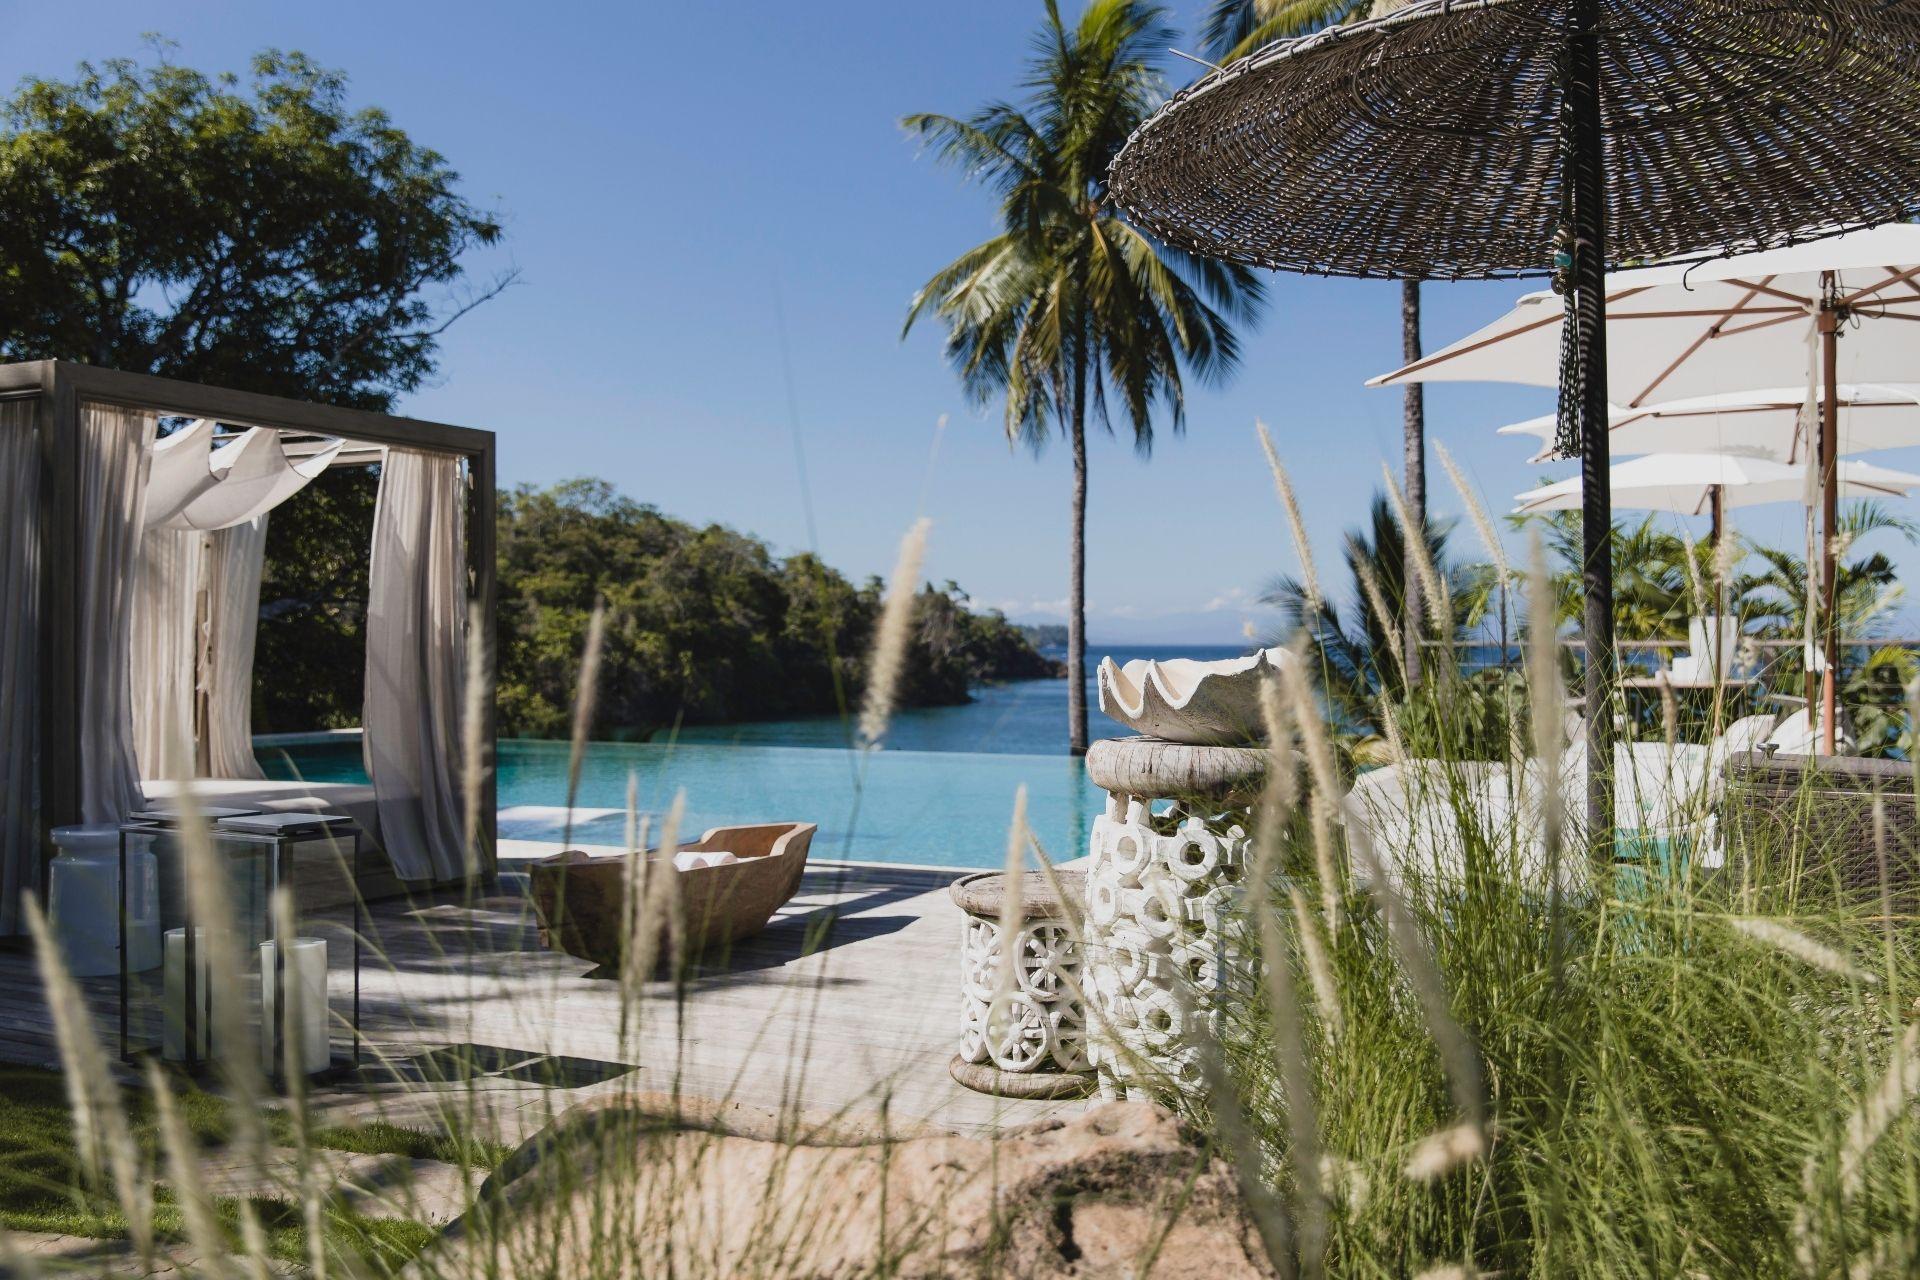 Move_Mountains_Luxury_Holidays_Sustainable_Americas_Panama_Islas_Secas_pool area